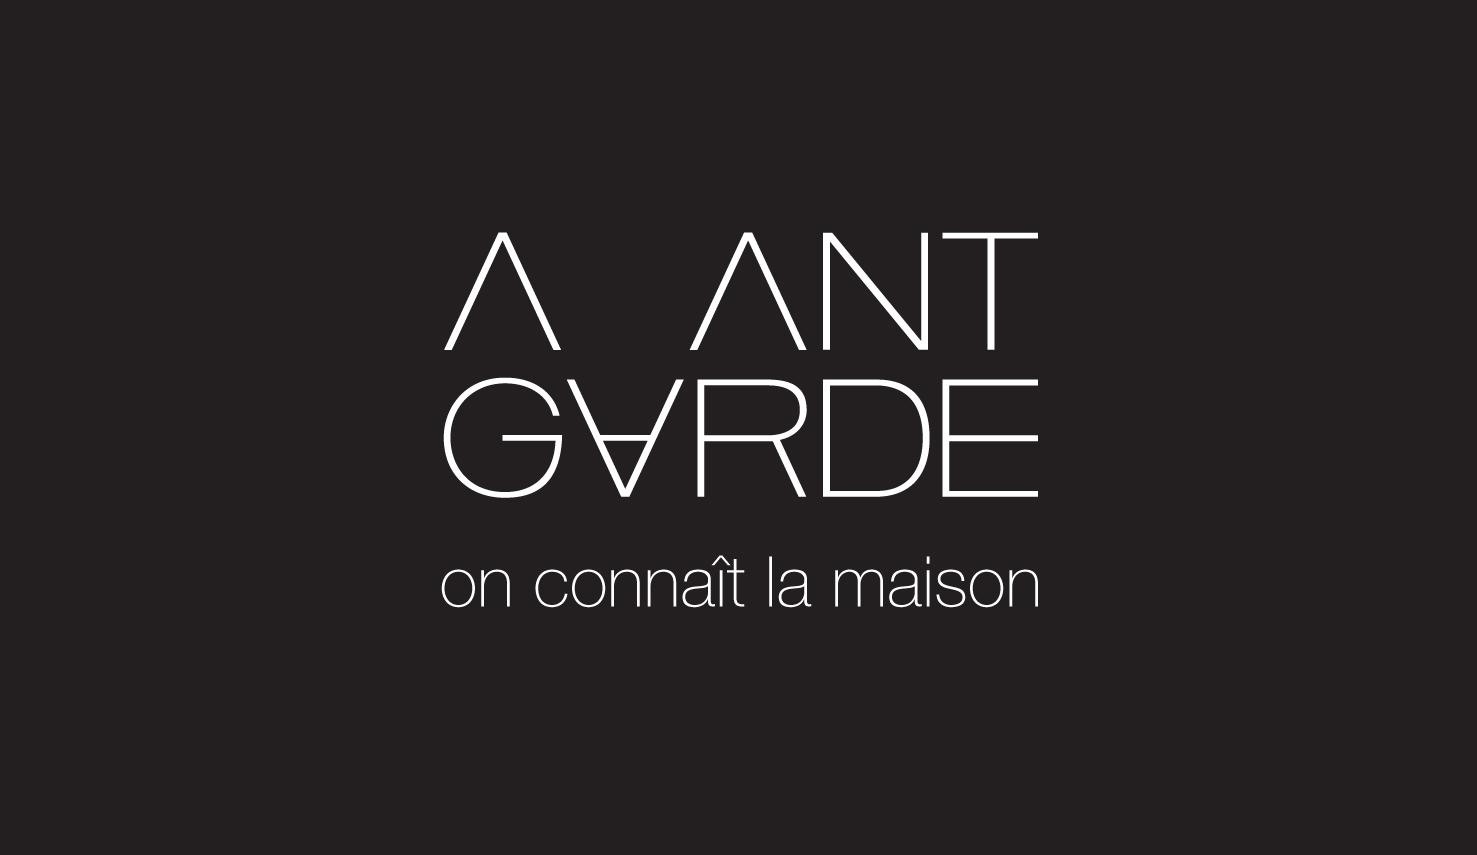 L'Atelier Avant-Garde Inc Quebec (418)651-1616